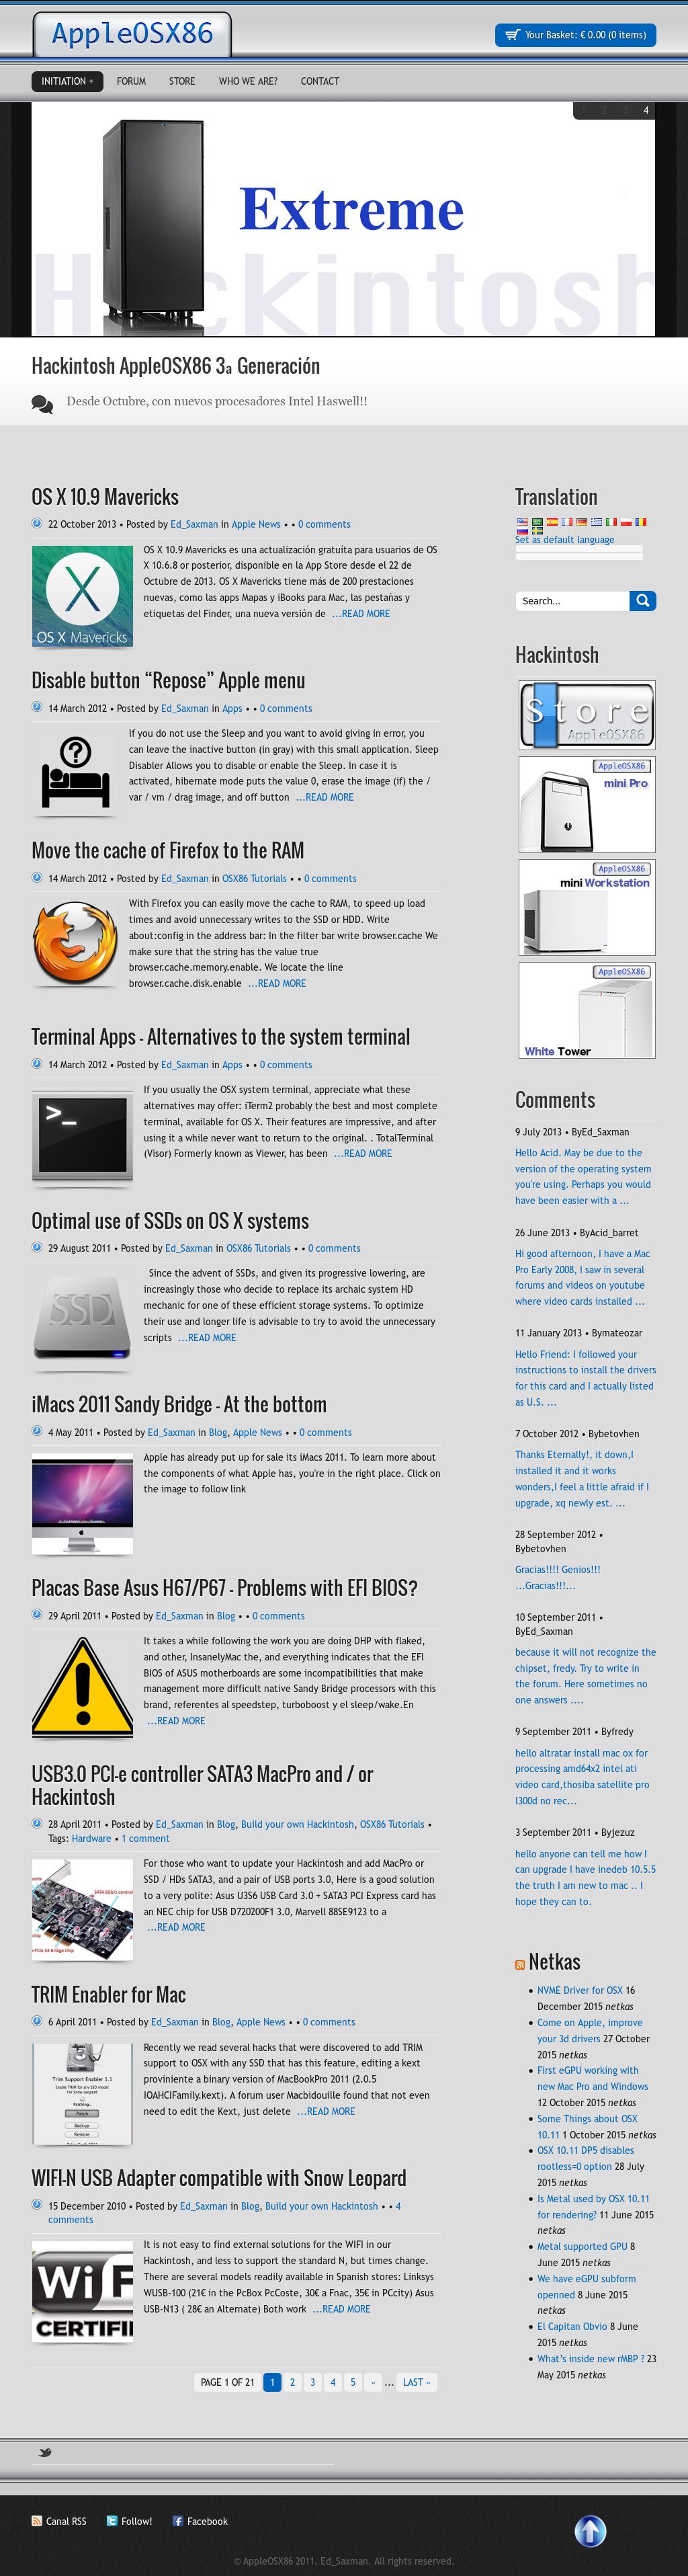 Appleosx86 Competitors, Revenue and Employees - Owler Company Profile